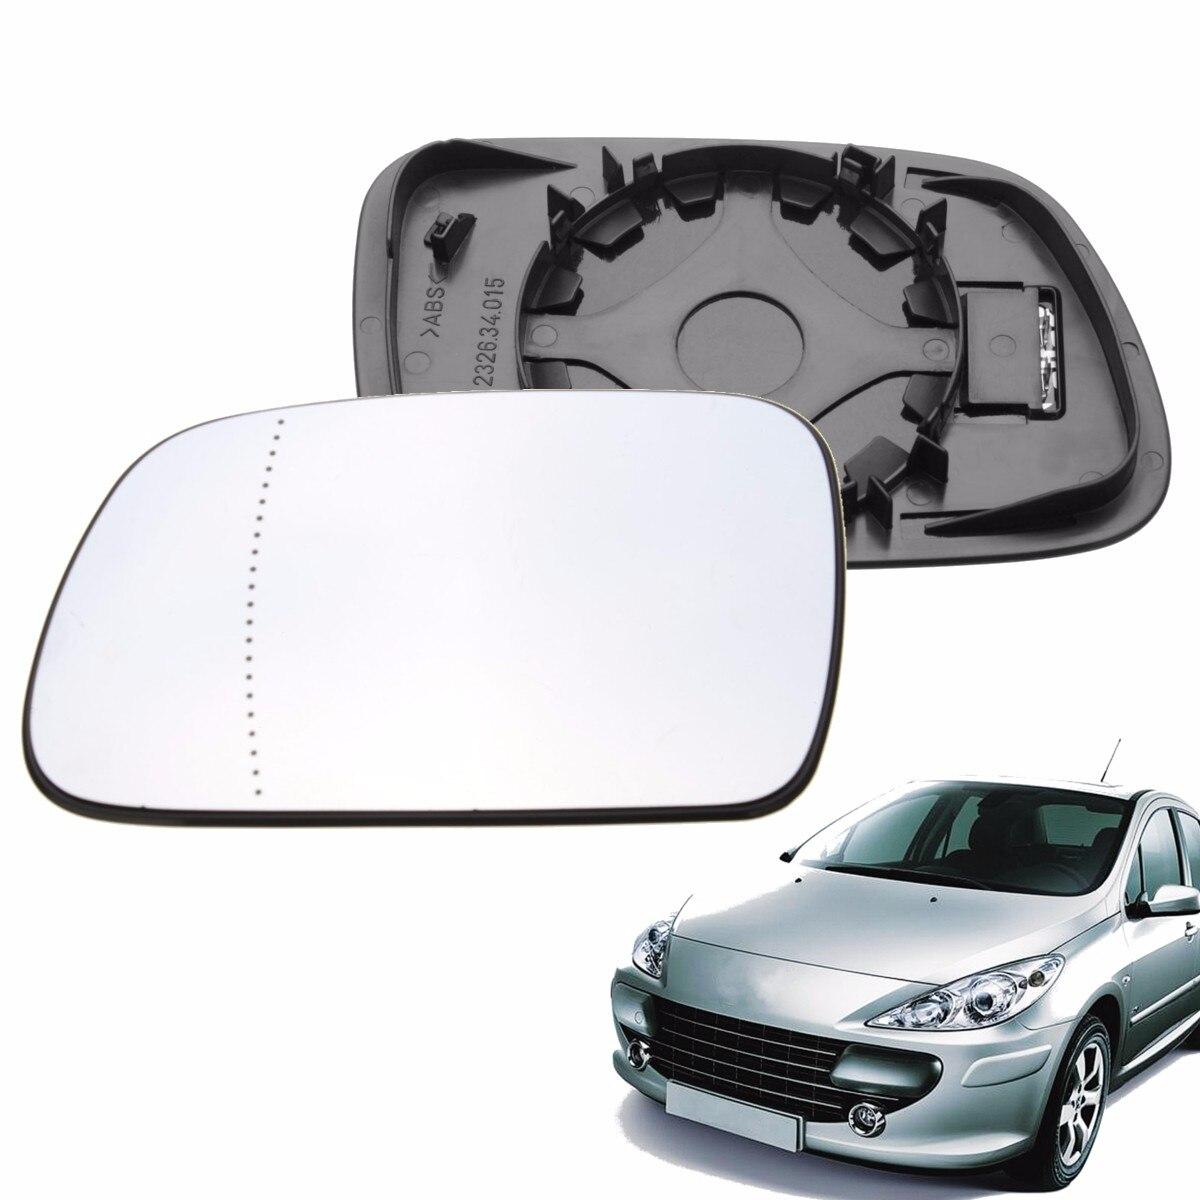 Izquierda Passenger Side gran angular climatizada ala puerta espejo para Peugeot 307 407